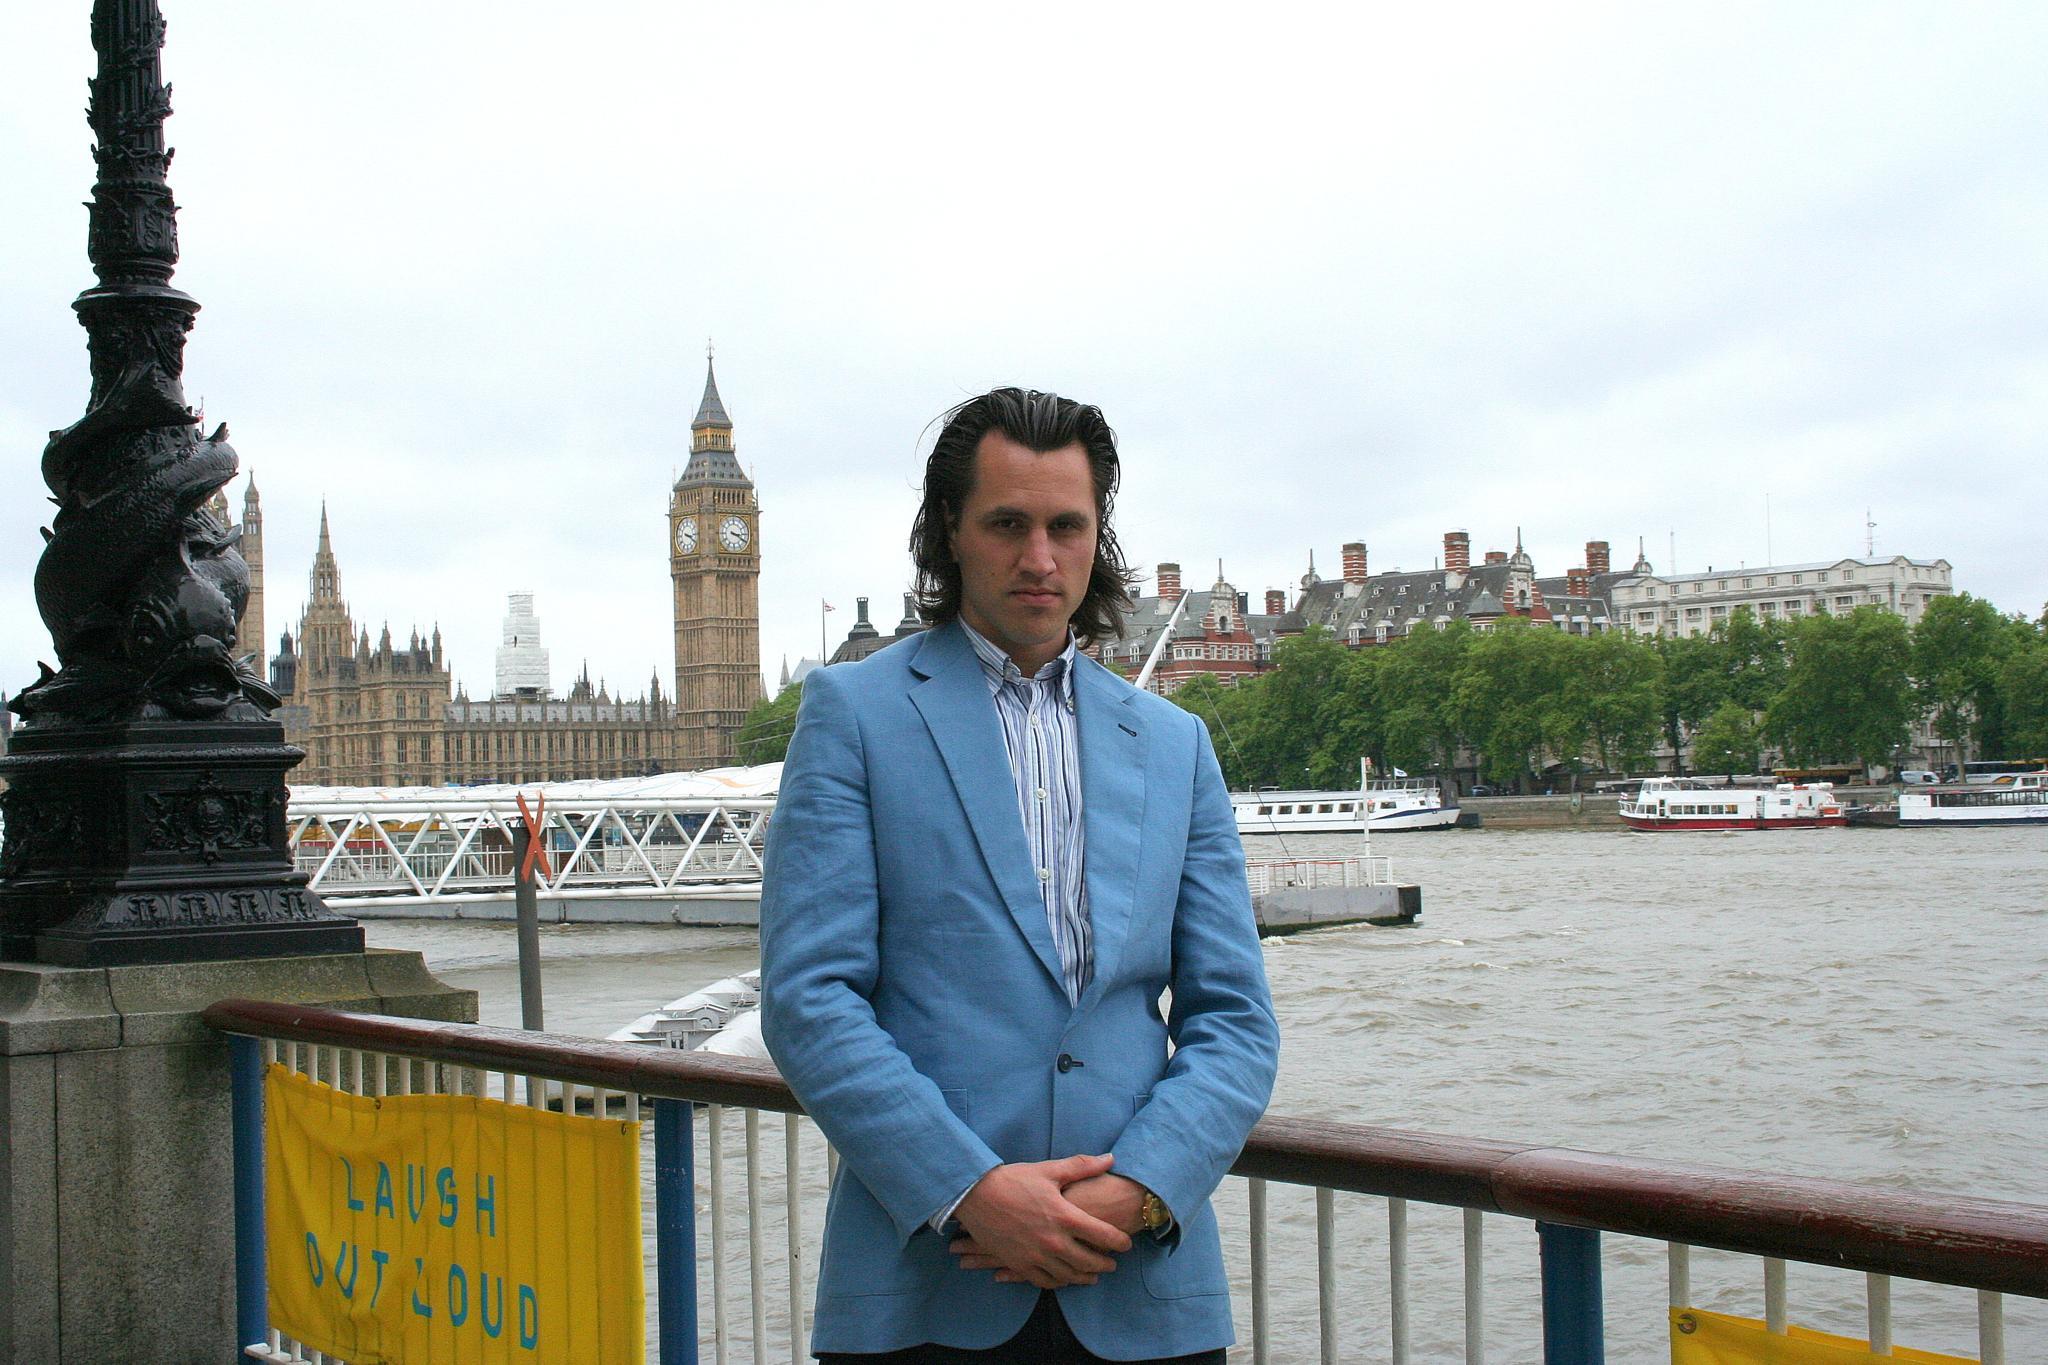 Me in London 2013 by EMR Photography & Fotomodel Marijn